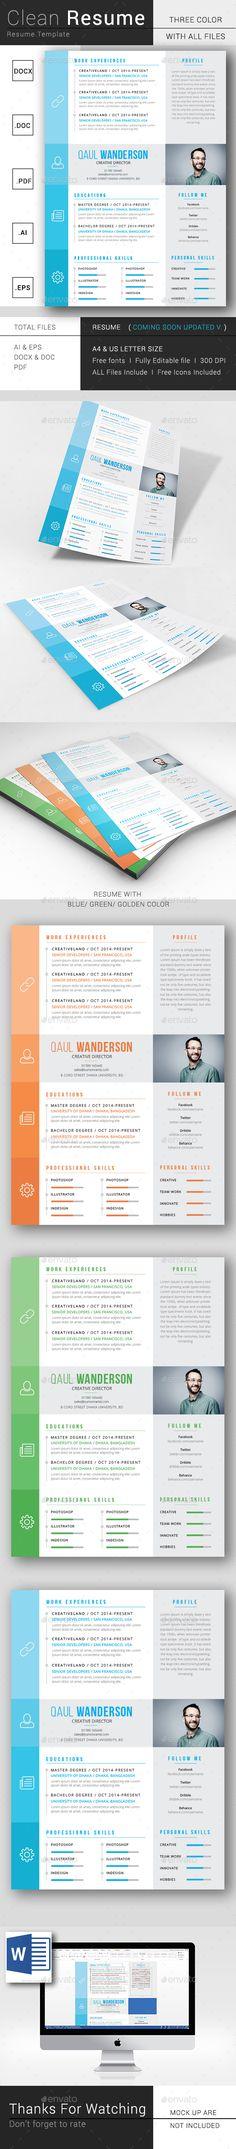 College Resume Template, Simple Resume Template, Creative Resume Templates, Cv Template, Cv Design, Resume Design, Graphic Design, Resume Layout, Resume Cv